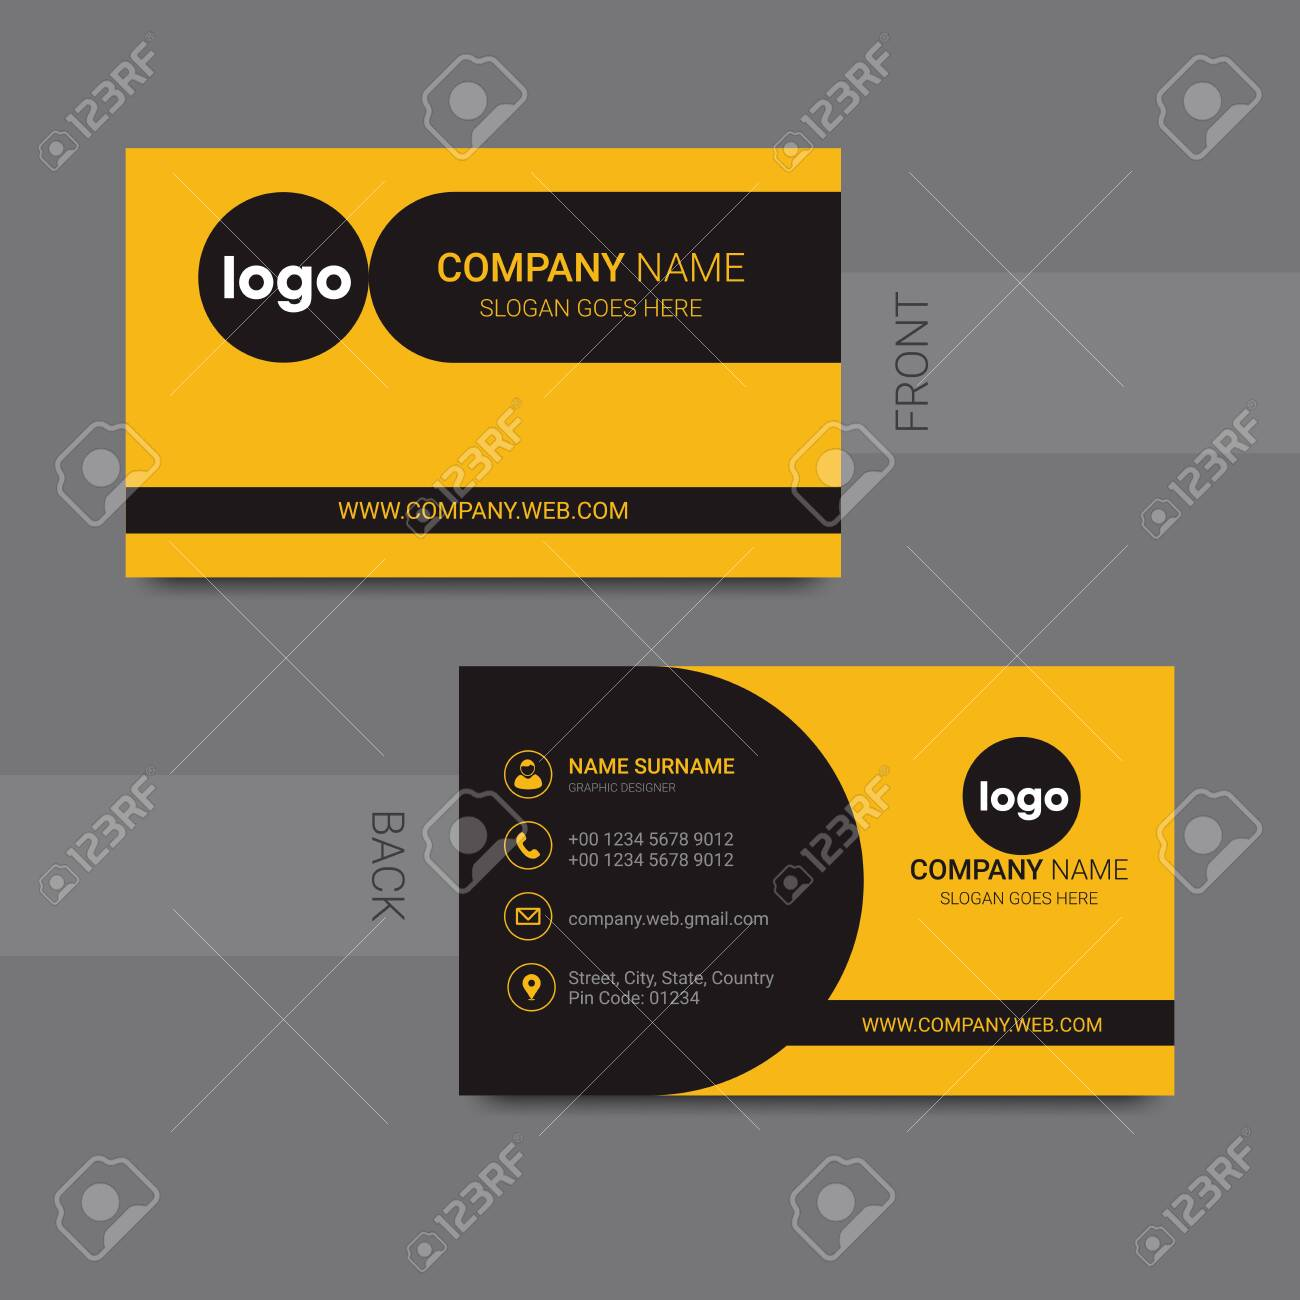 Presentation Card Template from previews.123rf.com